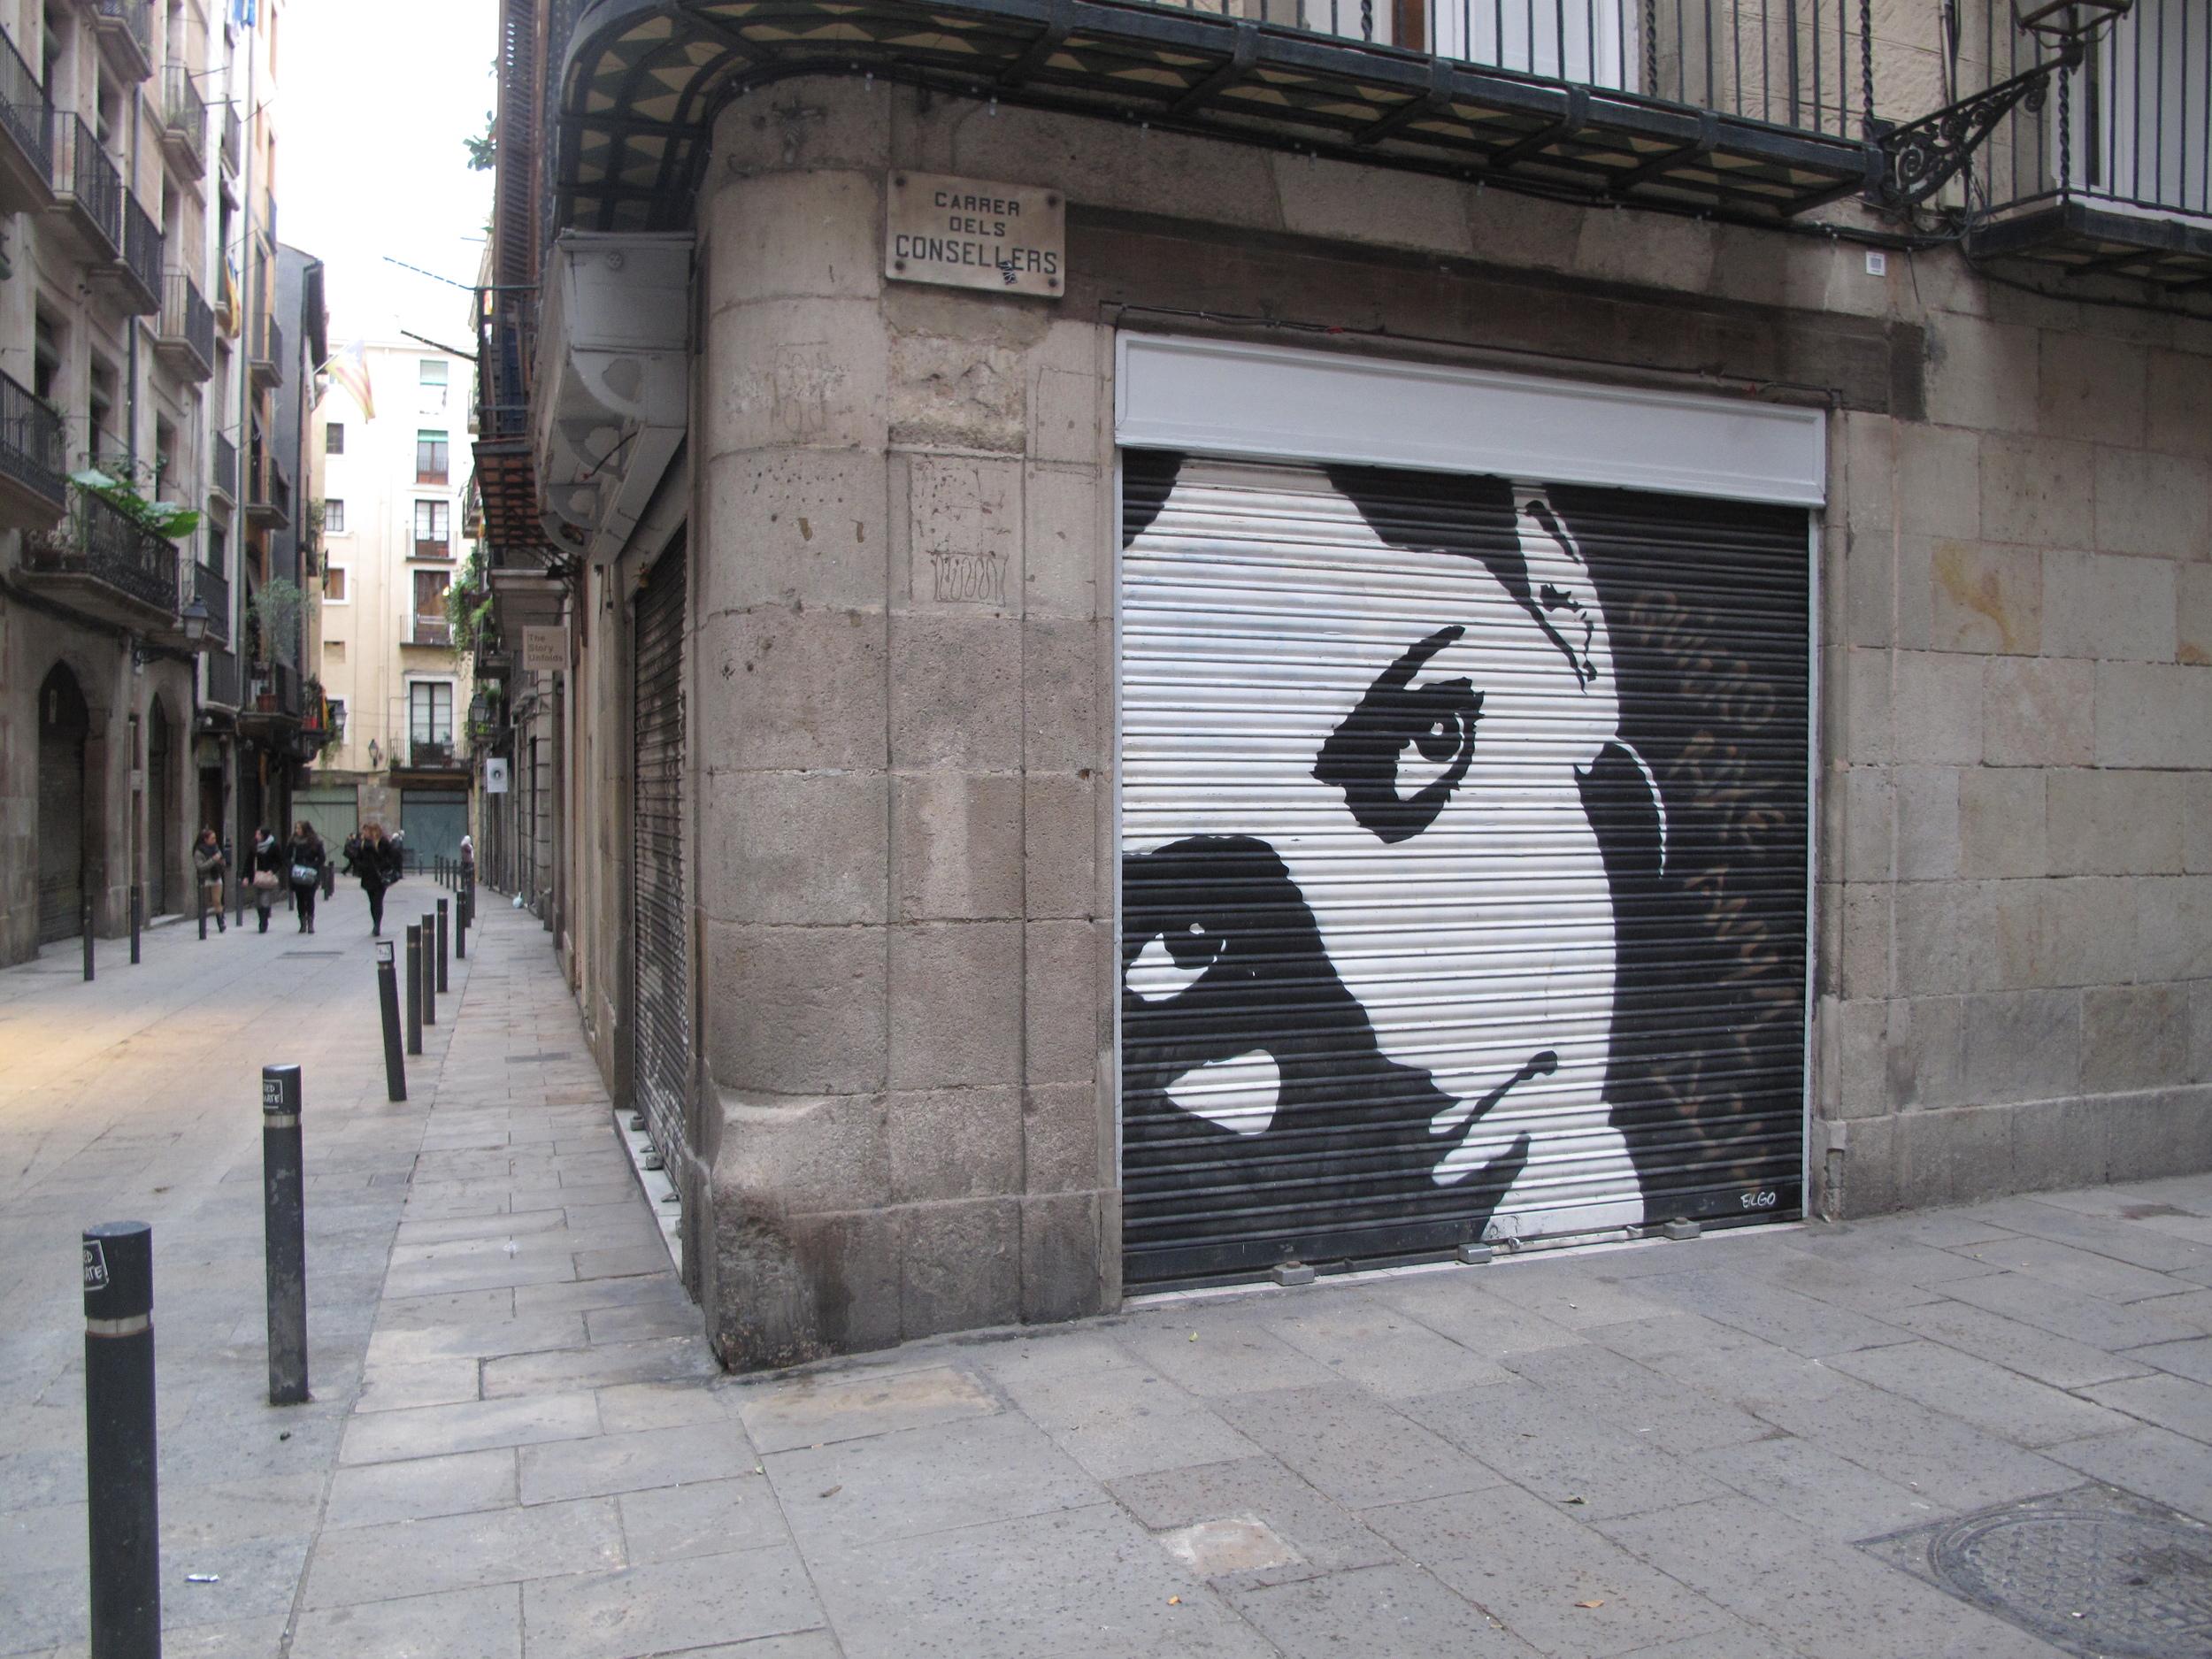 Barcelona street art - painting of a woman.